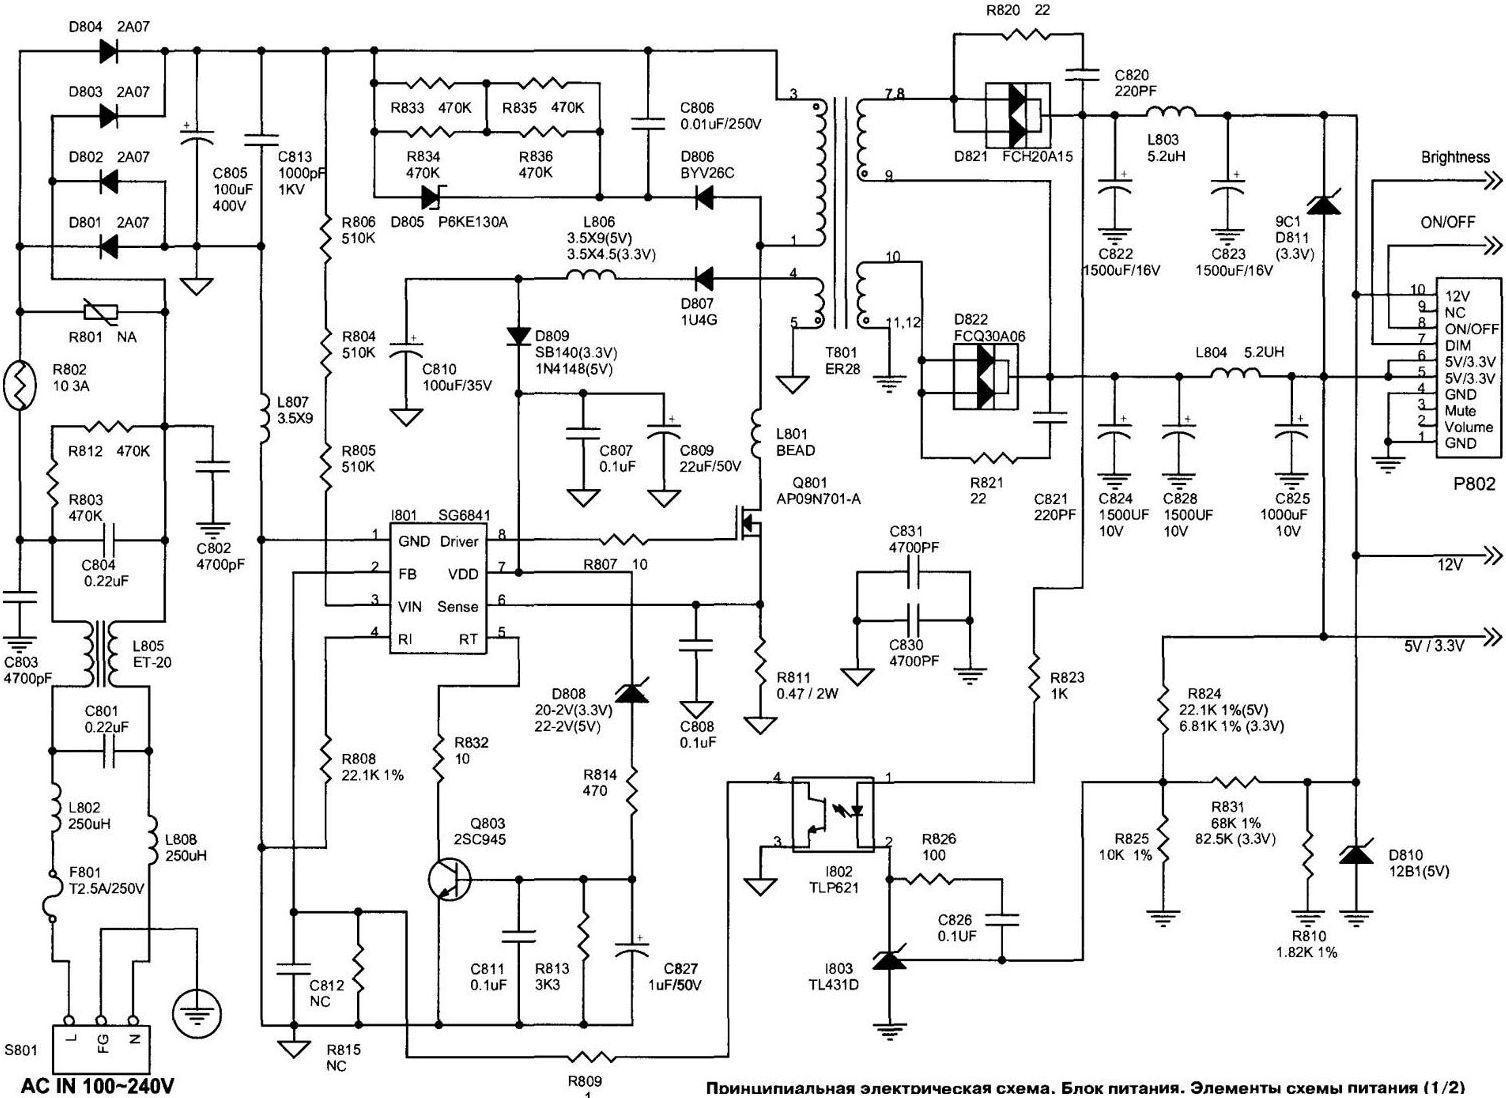 Схема блока питания монитора Самсунг 943N